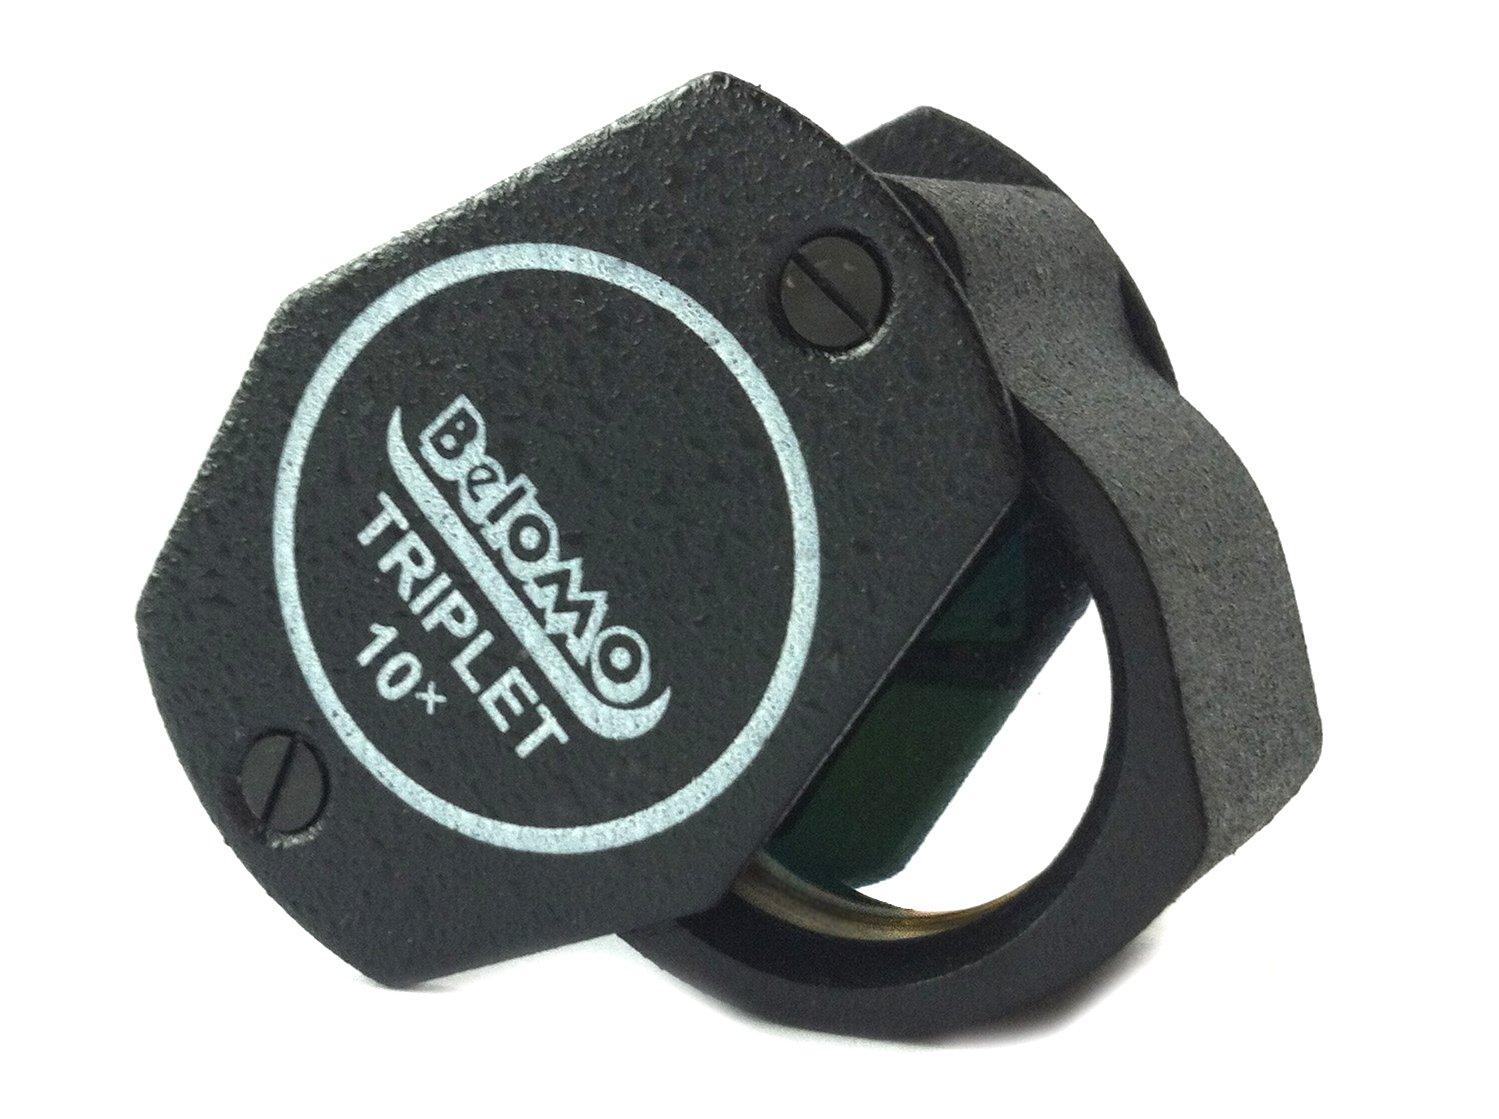 BelOMO 10x Triplet Loupe Folding Magnifier